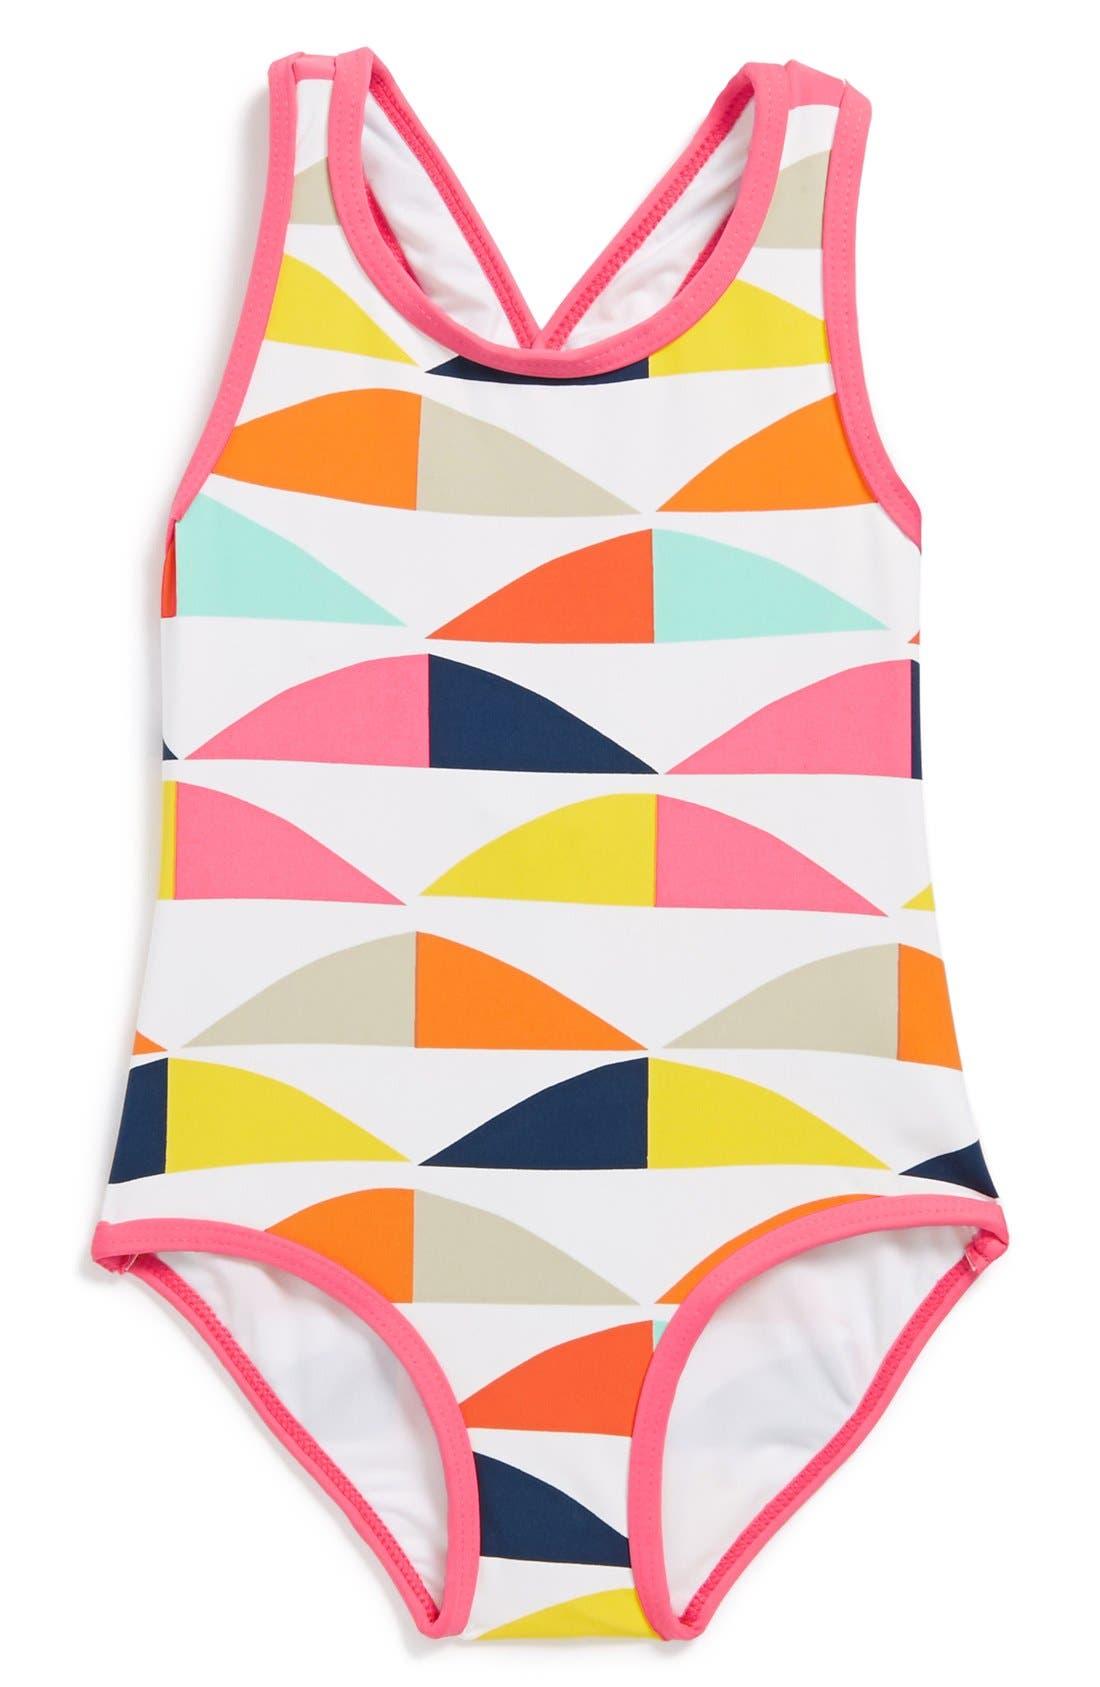 Main Image - Marimekko 'Polsku' One-Piece Swimsuit (Baby Girls)